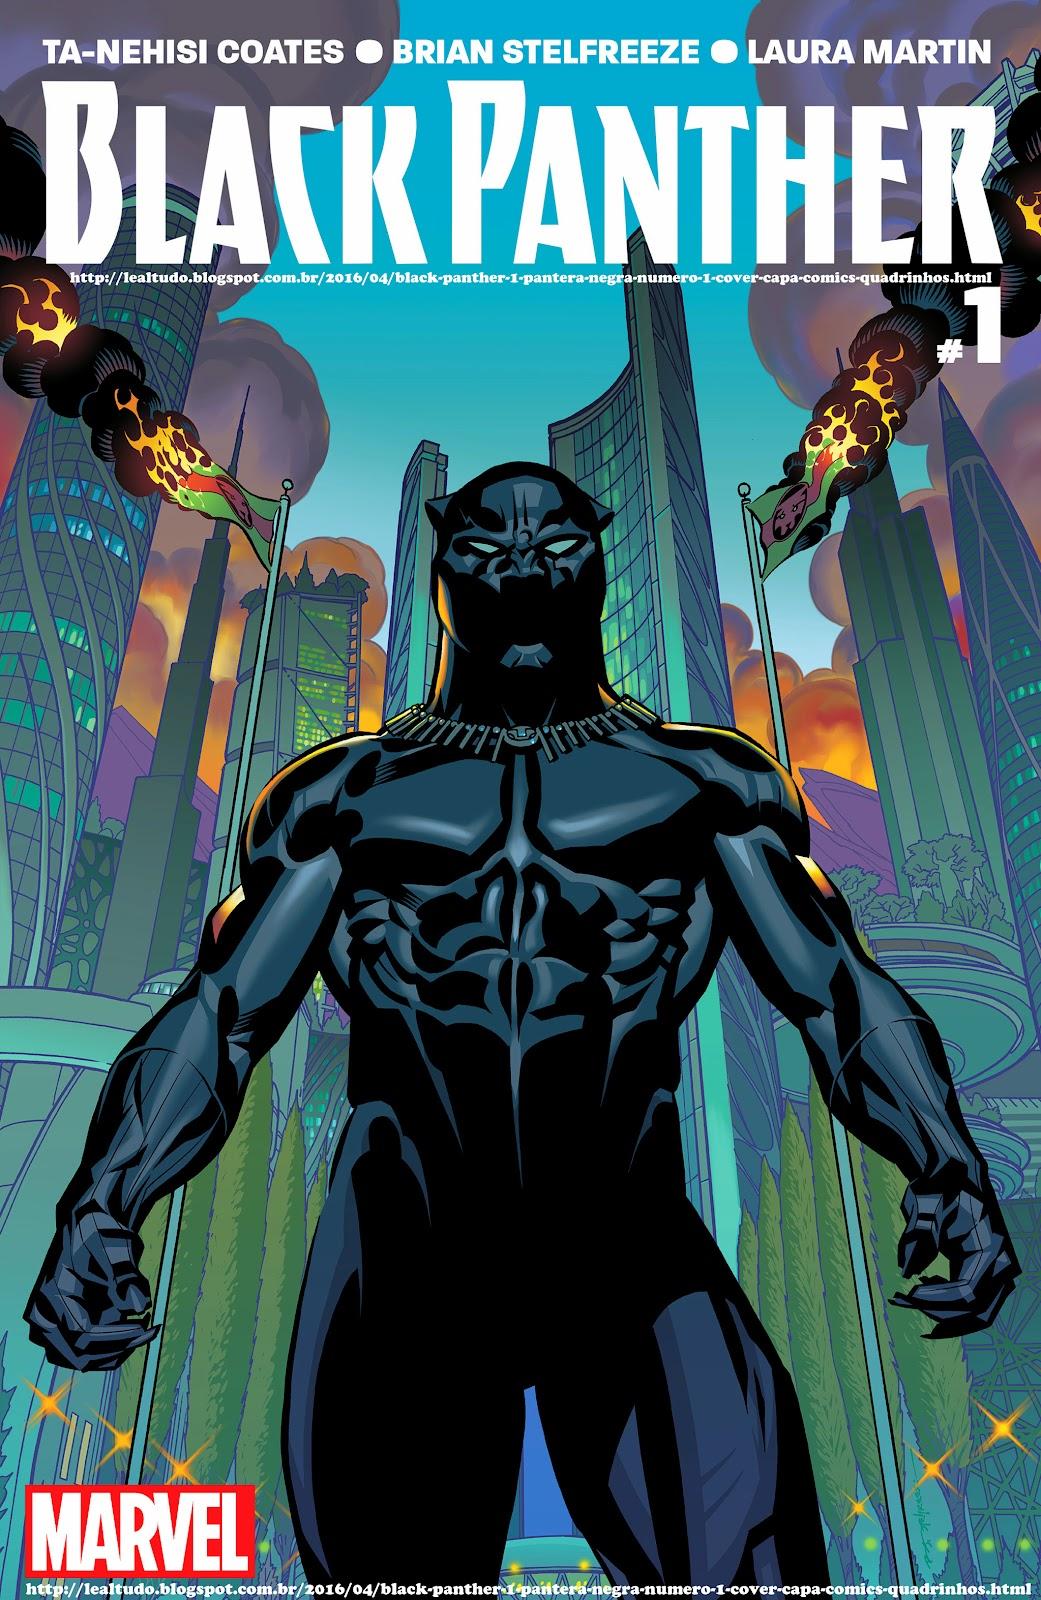 BLACK PANTHER #1 PANTERA NEGRA Número 1 By Ta-Nehisi Coates & Brian Stelfreeze - Desenhos Drawings Comics Revista em Quadrinhos. Cover Capa.